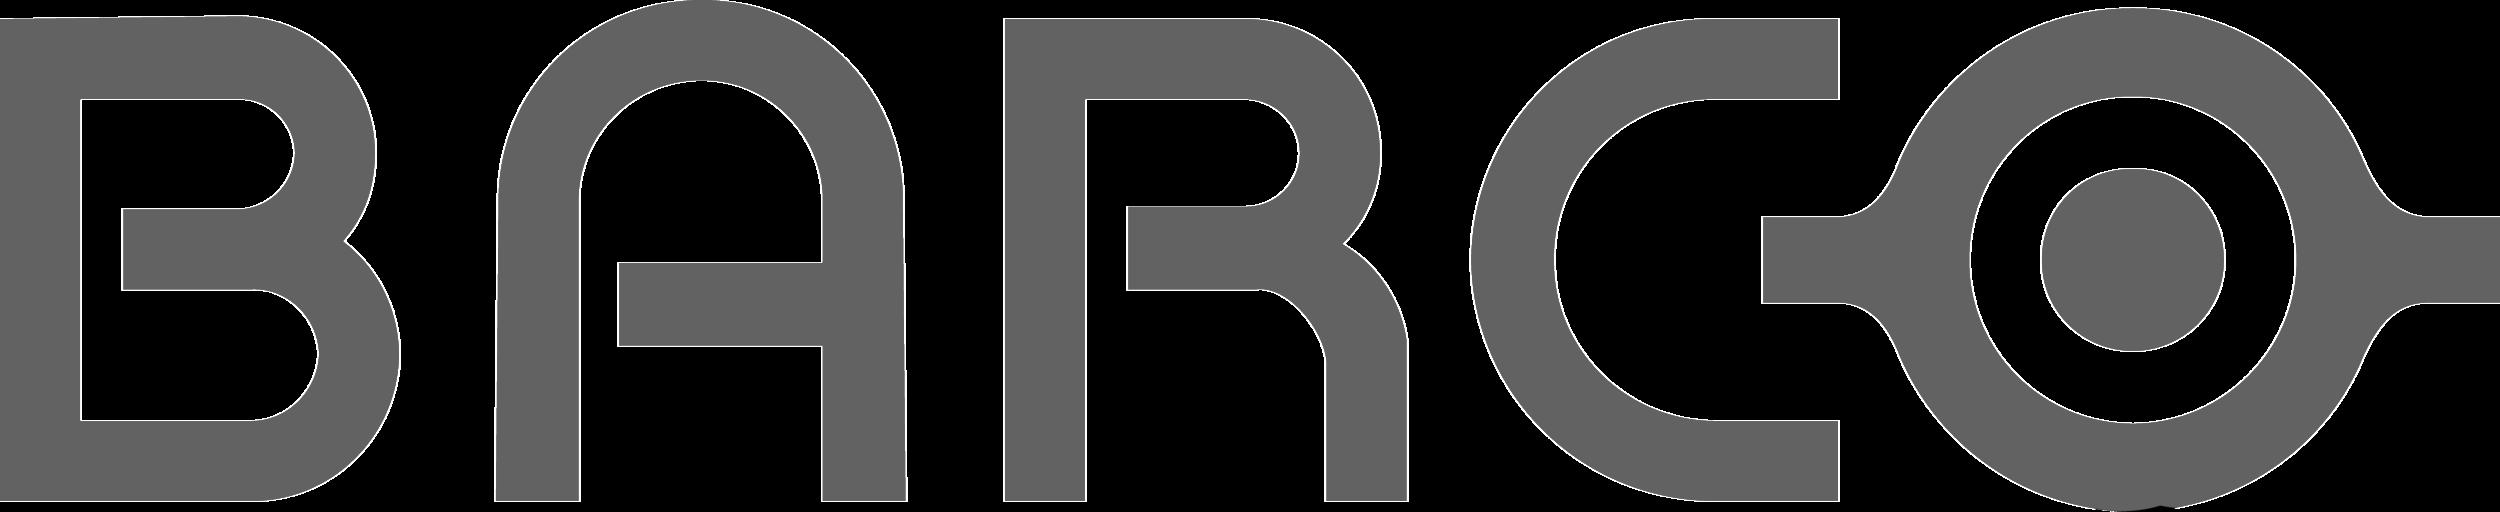 barco logo gray.png